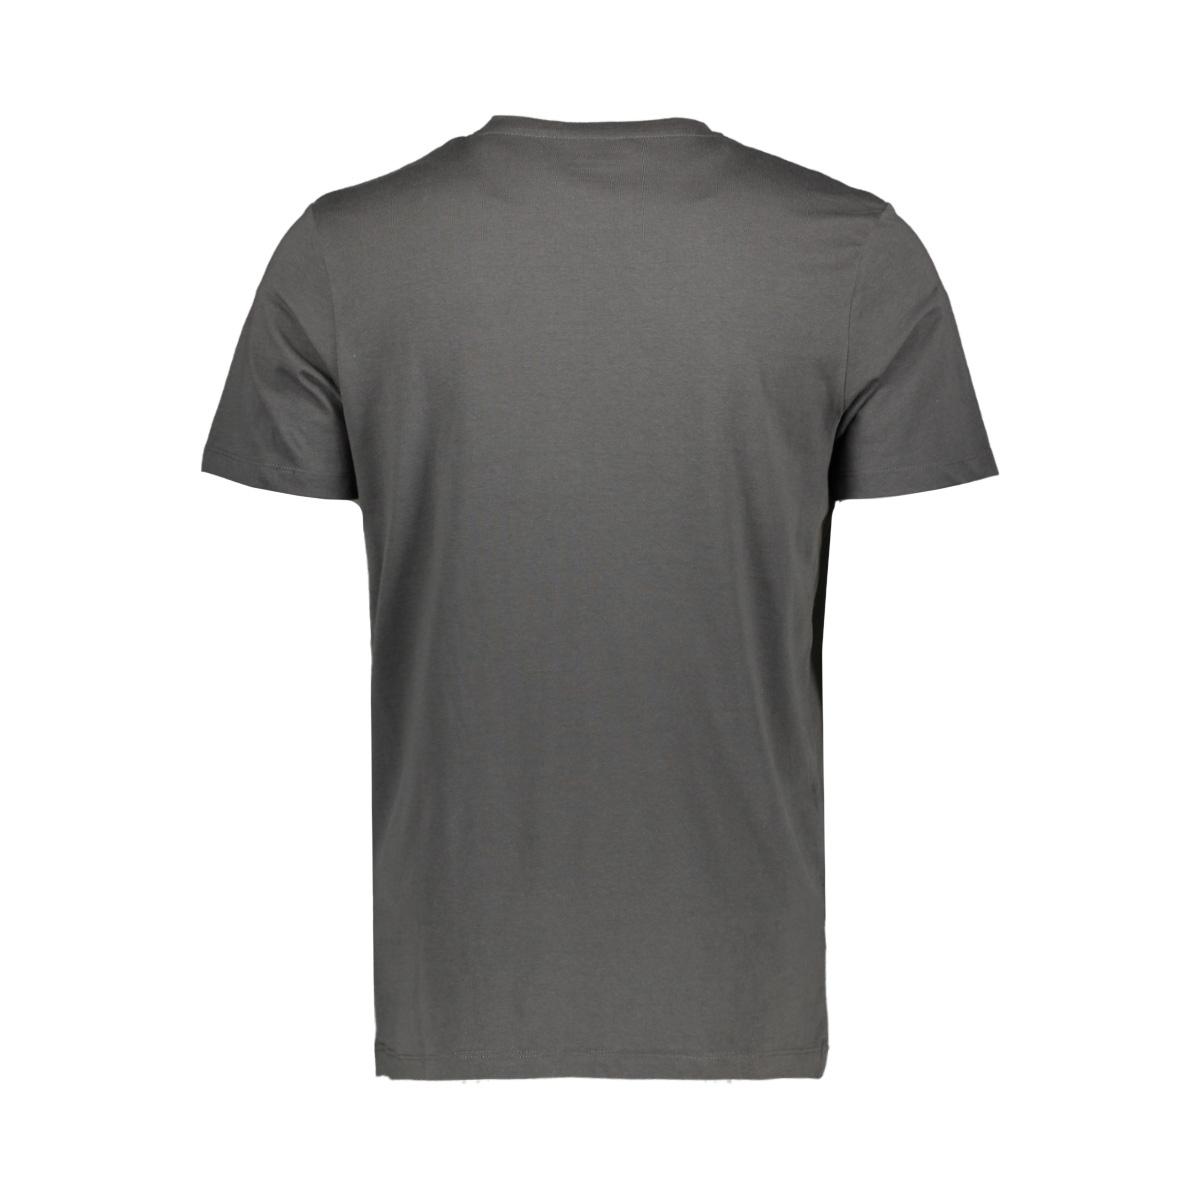 jorfading tee ss crew neck 12170562 jack & jones t-shirt asphalt/reg